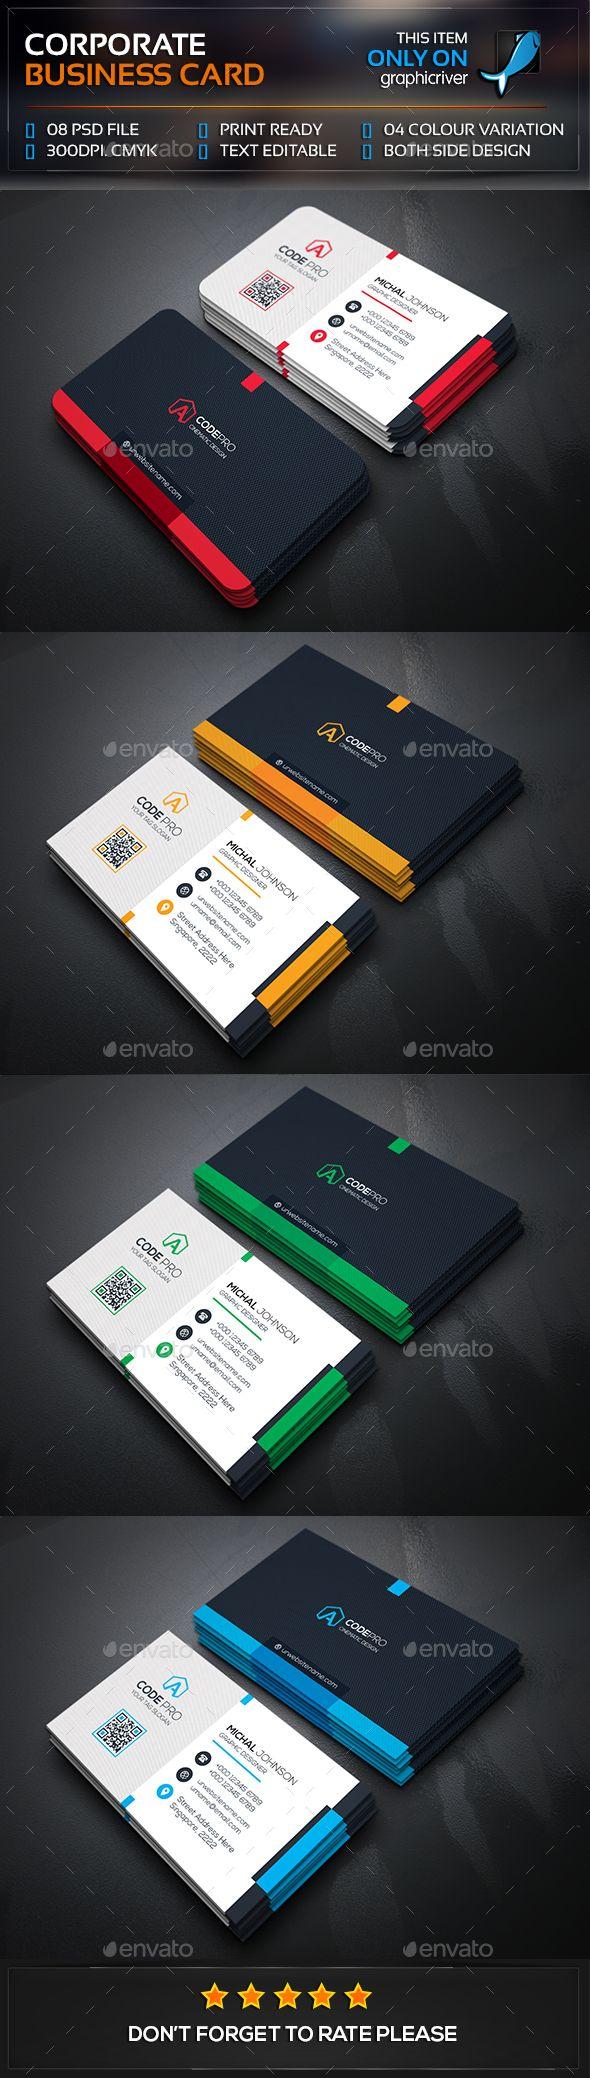 Mega Corporate Business Card Template PSD #visitcard #design Download: http://graphicriver.net/item/mega-corporate-business-card/13477438?ref=ksioks